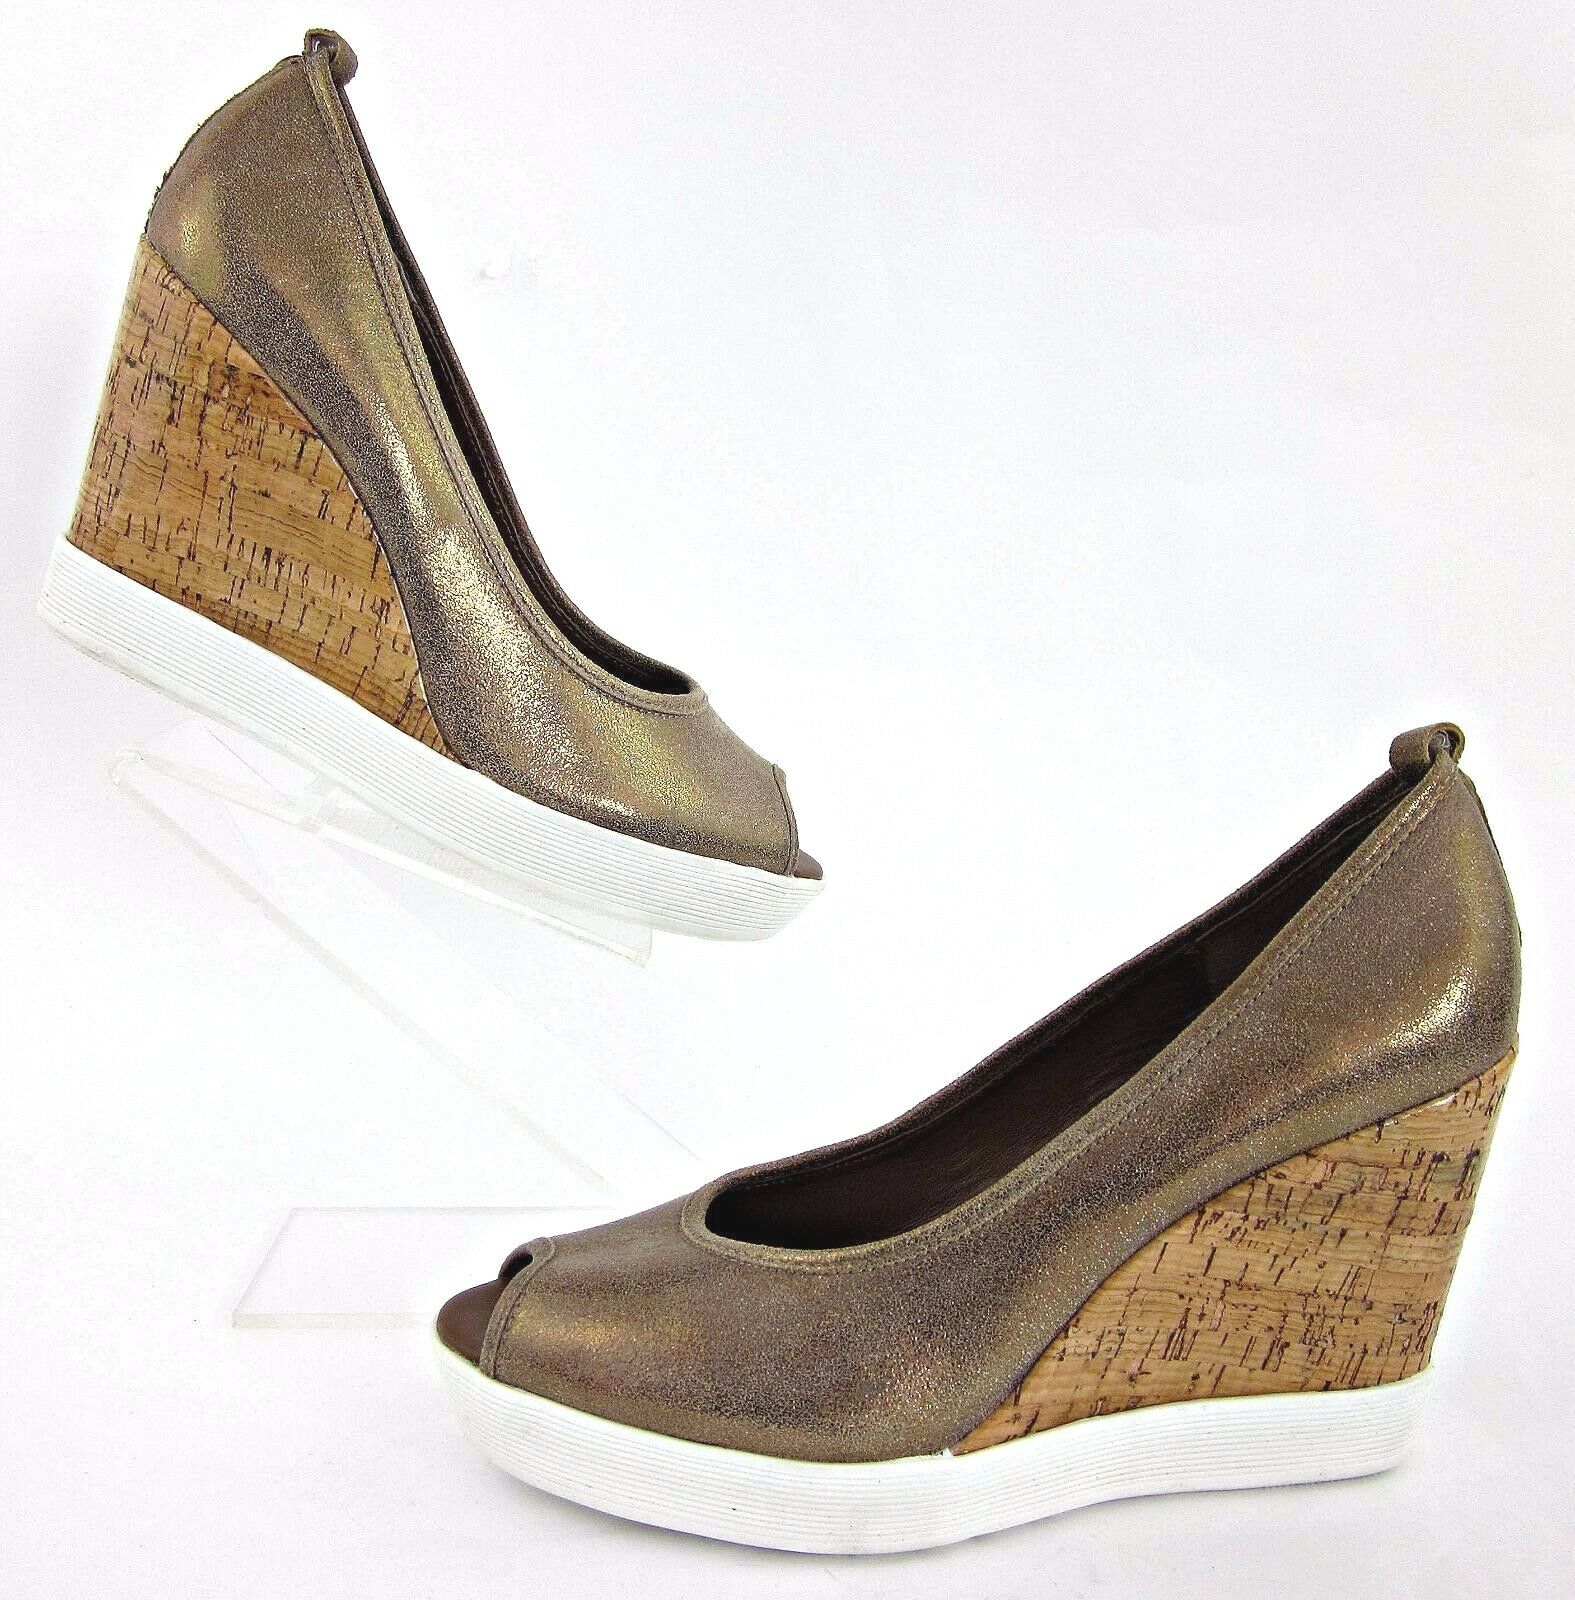 Donald J Pliner 'Carli' Peep Toe Cork Wedges Shimmer Bronze Sz 10M